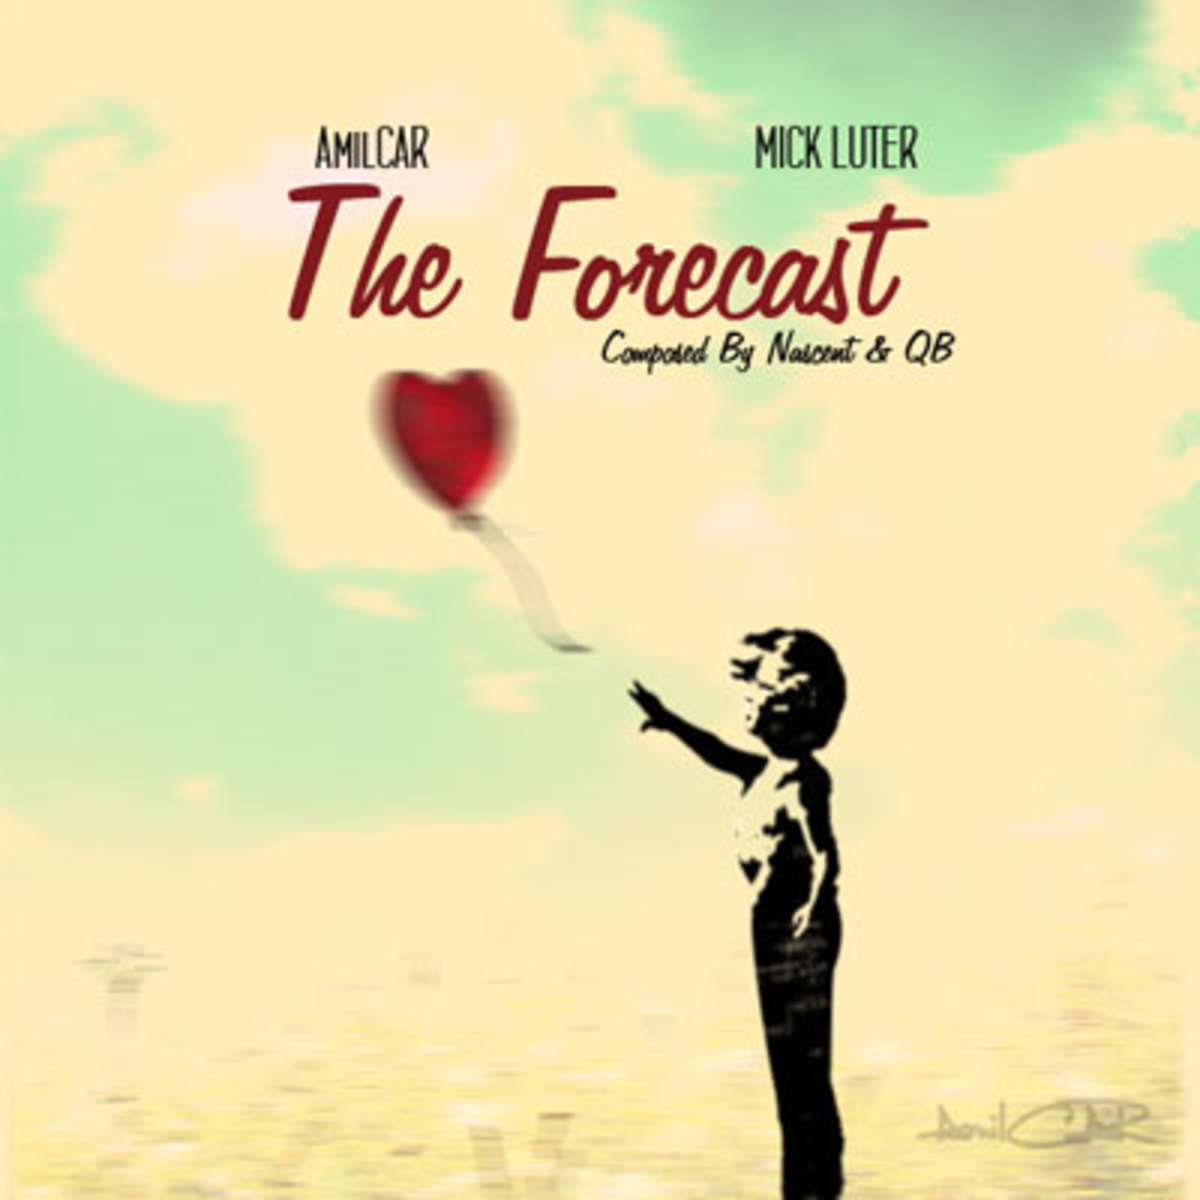 amilcar-theforecast.jpg